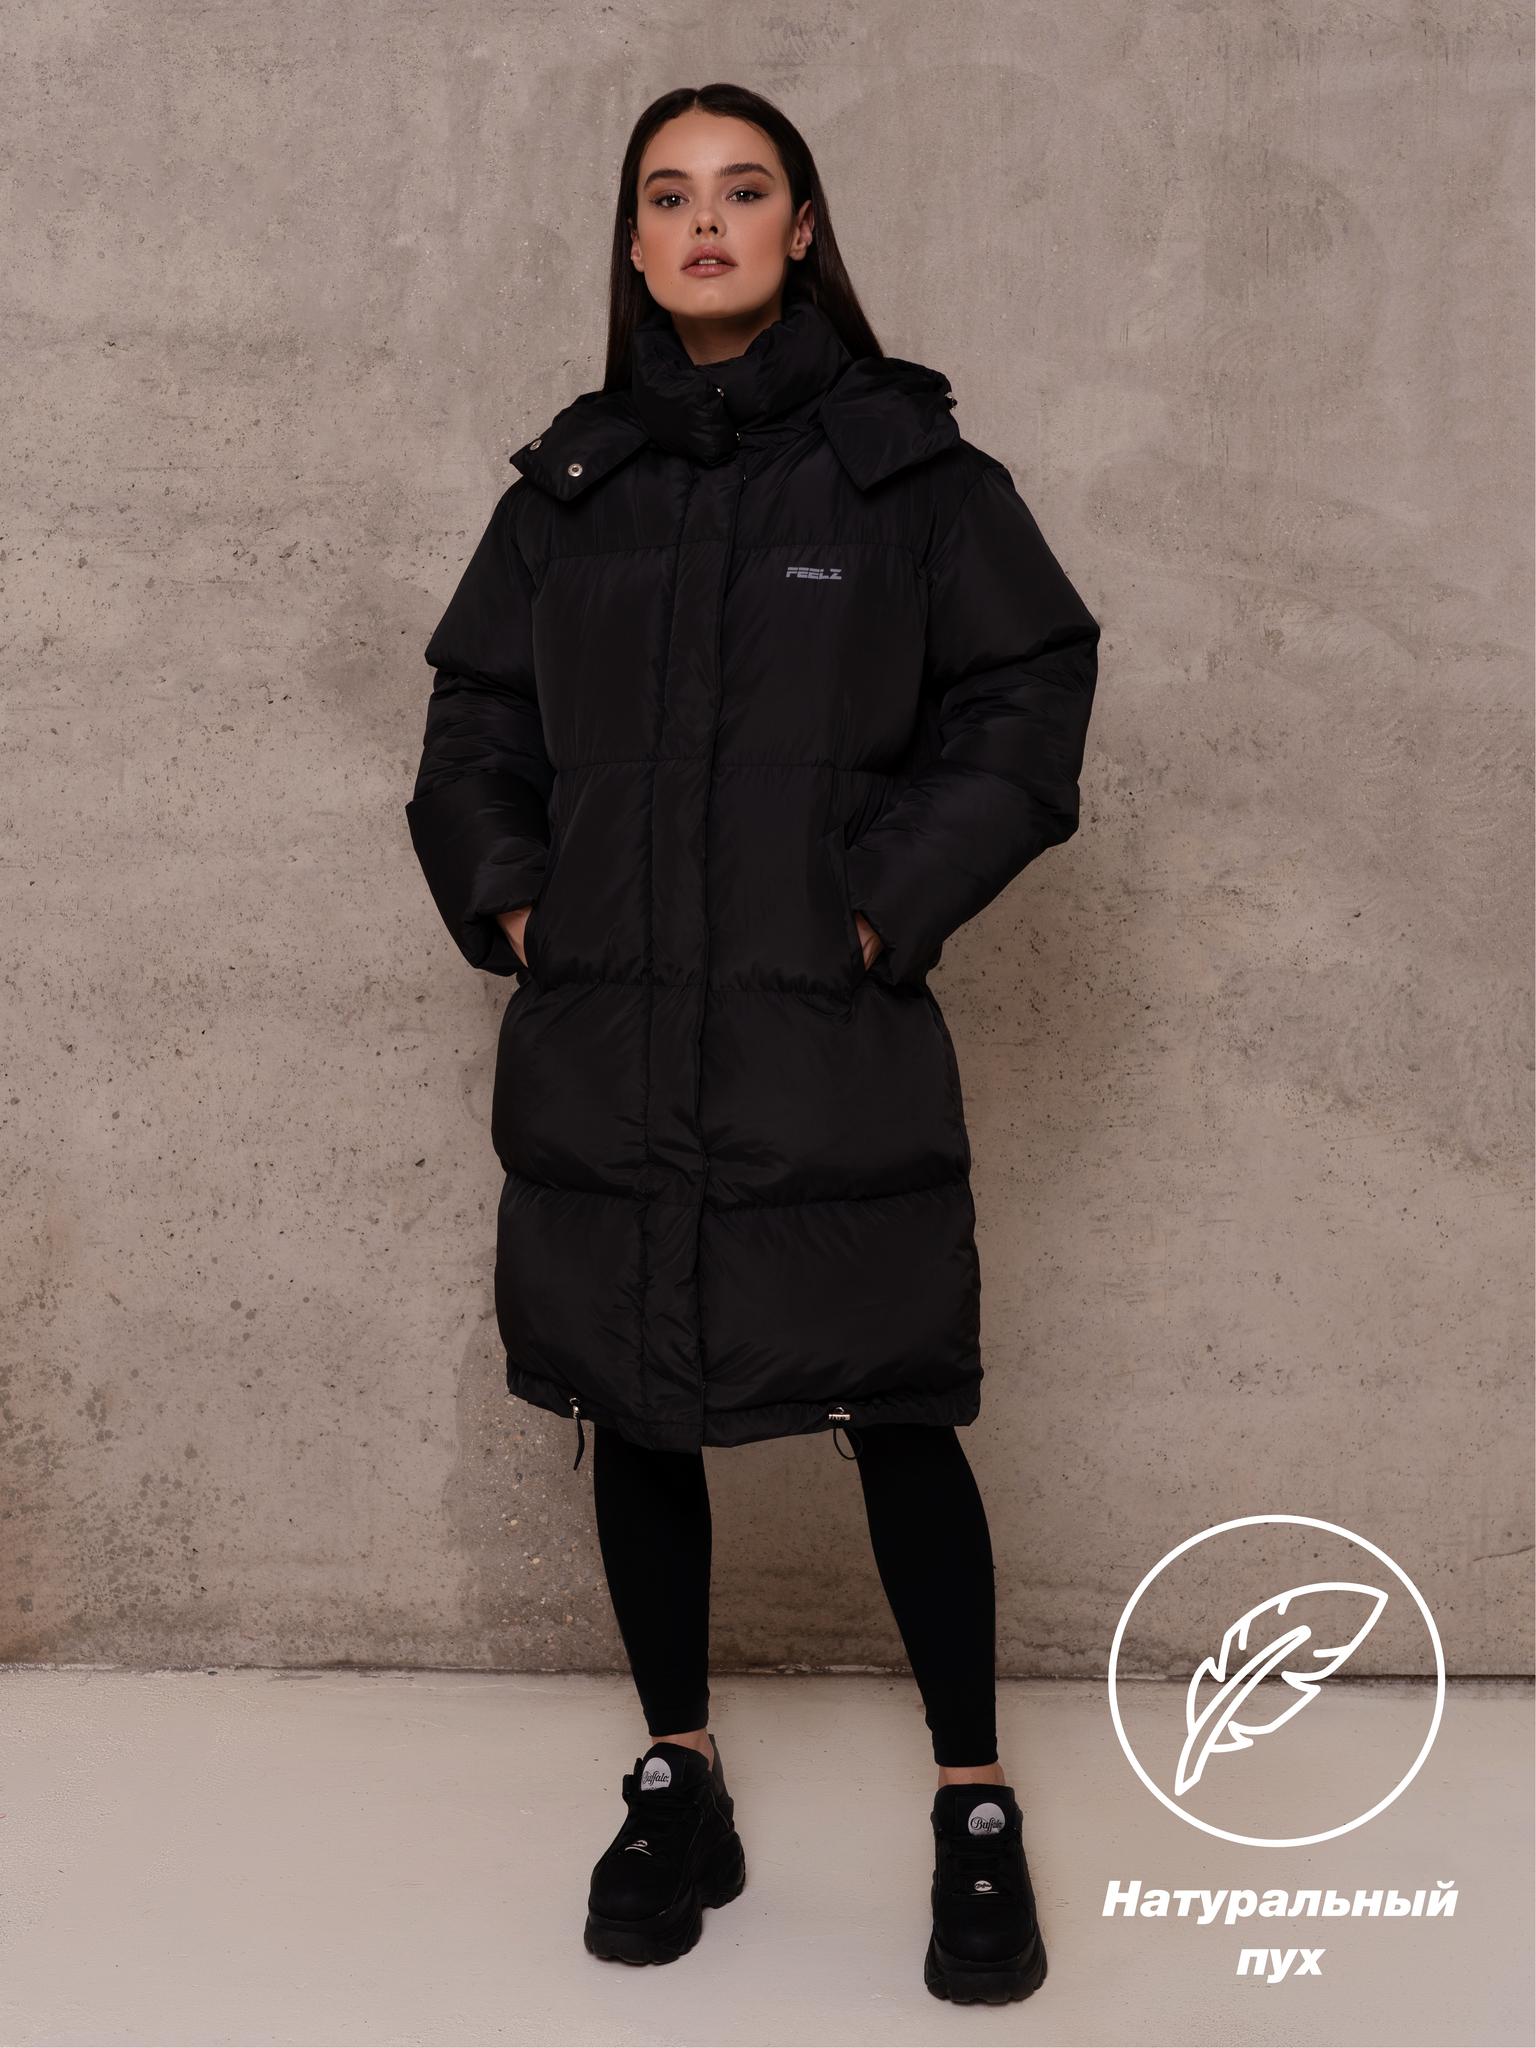 Куртка пуховик Feelz Edge, Черный